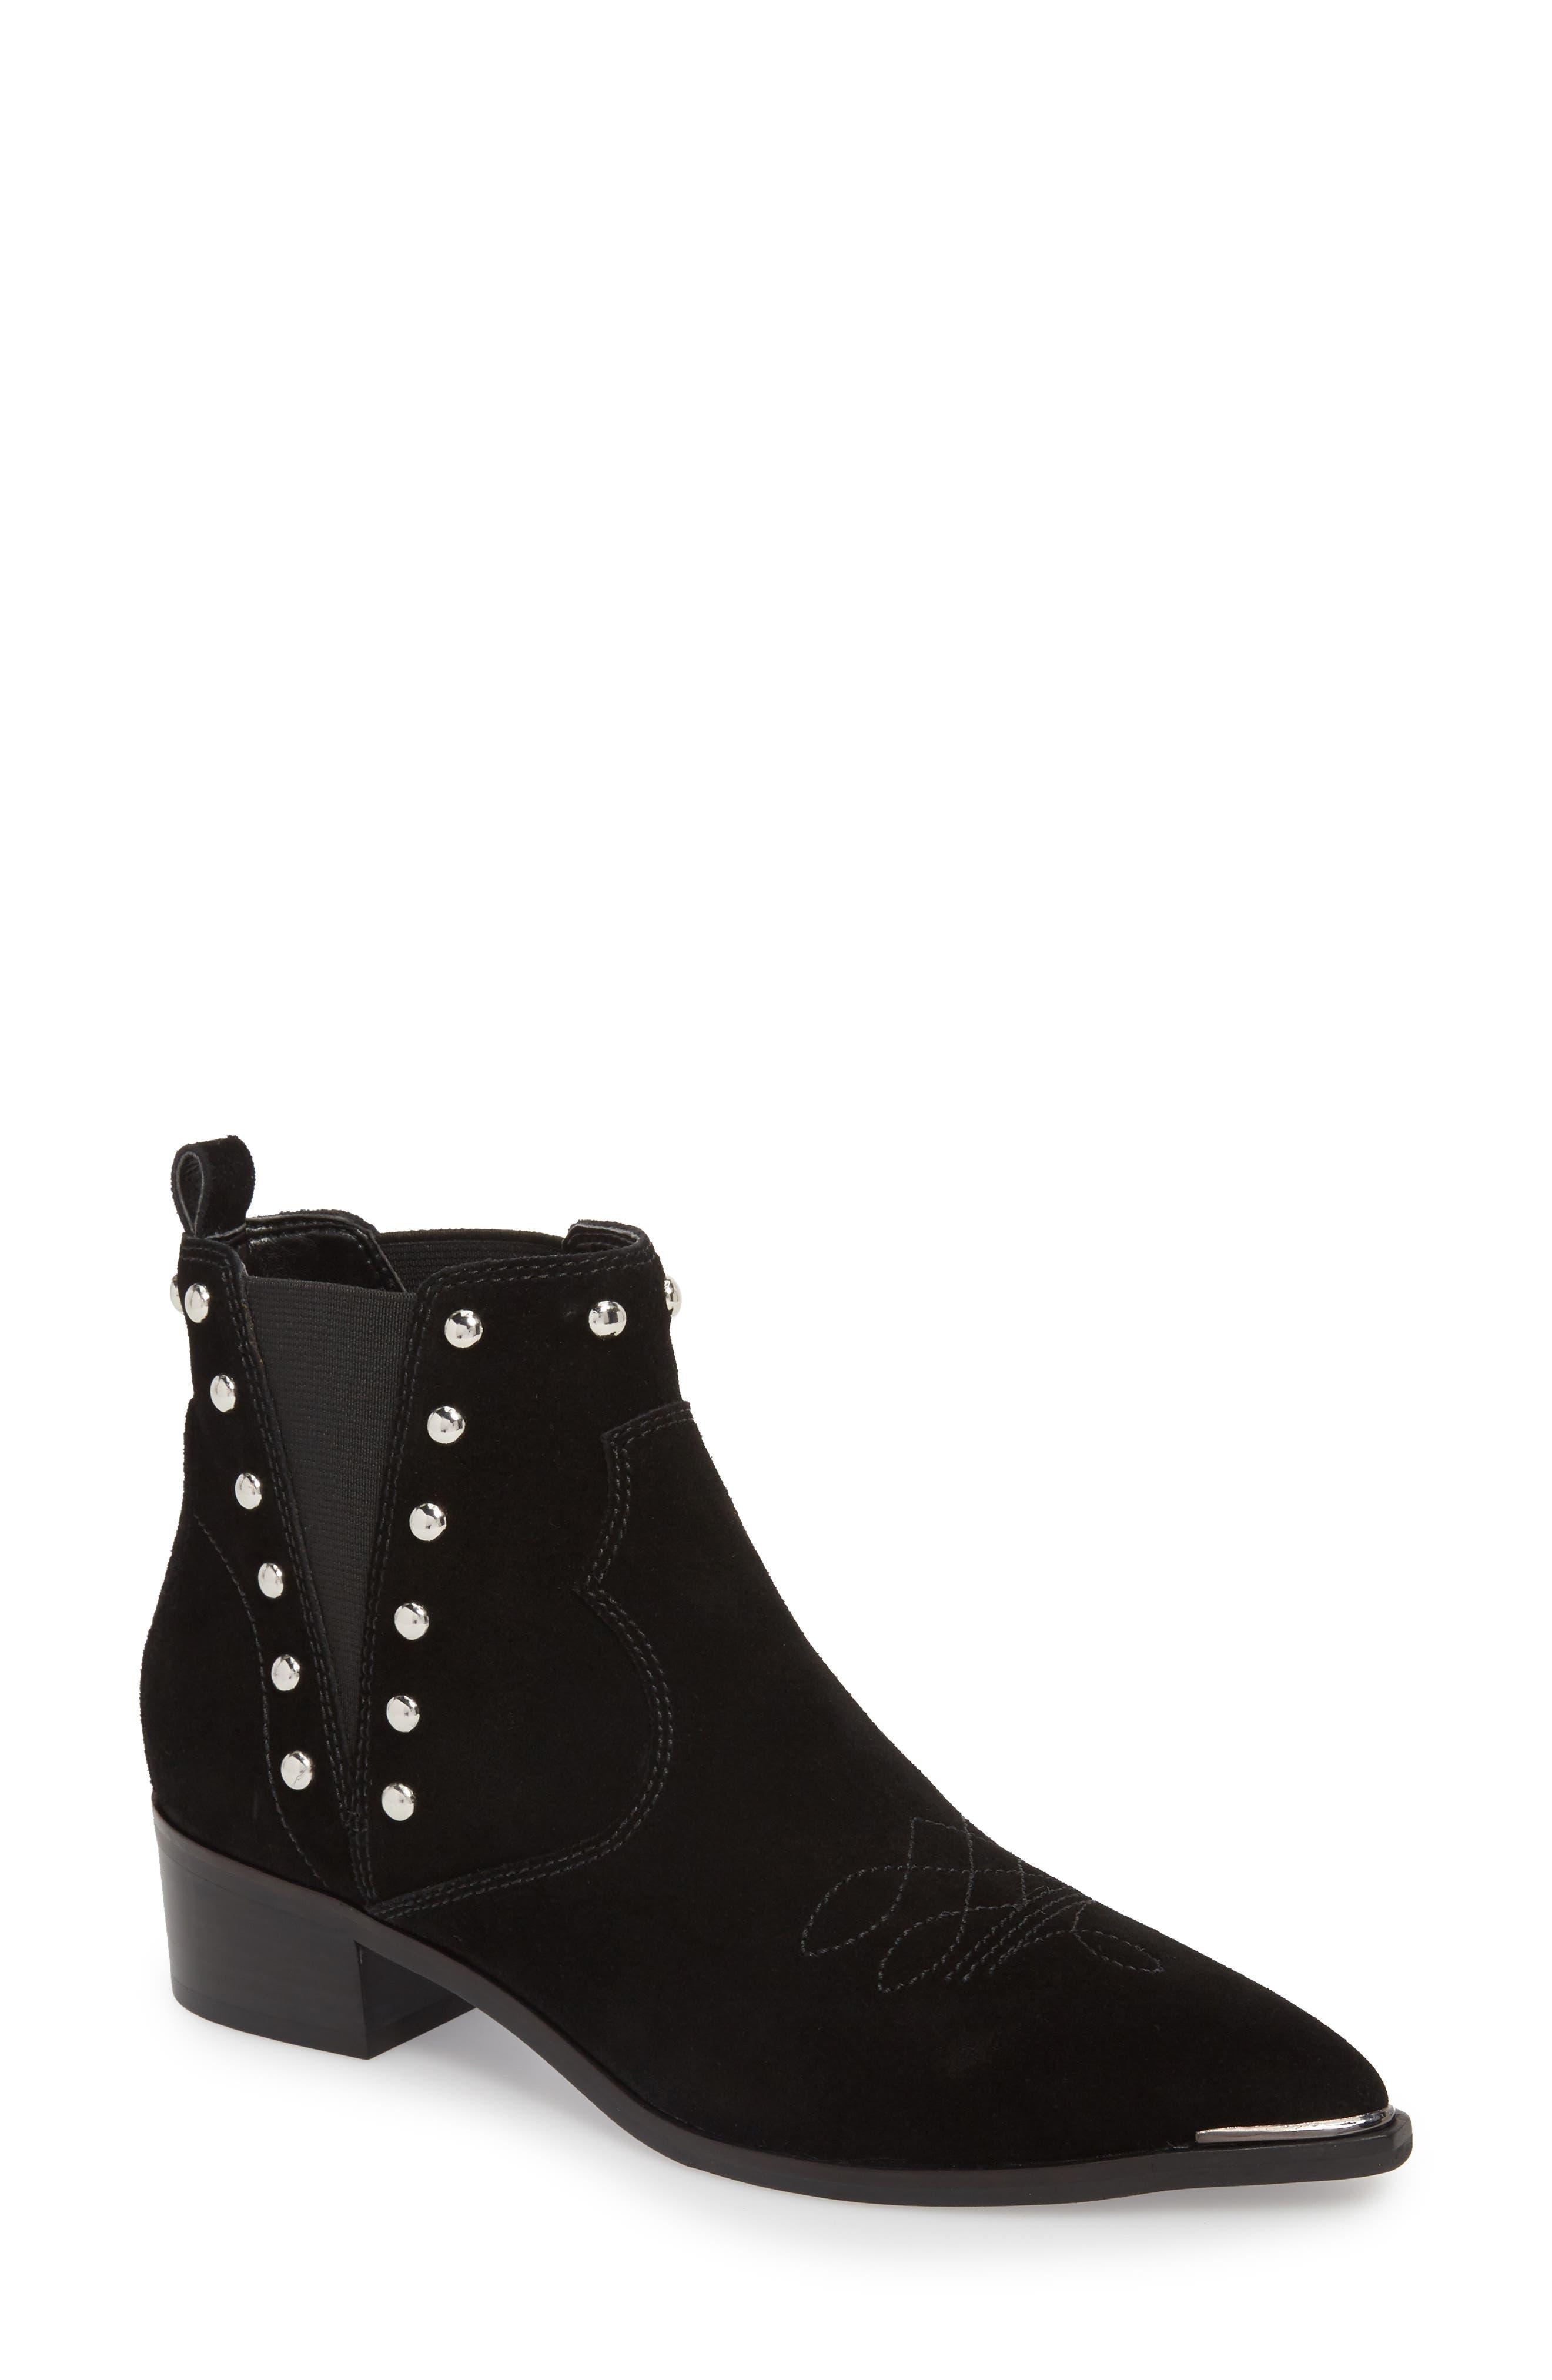 Yente Chelsea Boot,                         Main,                         color, 001